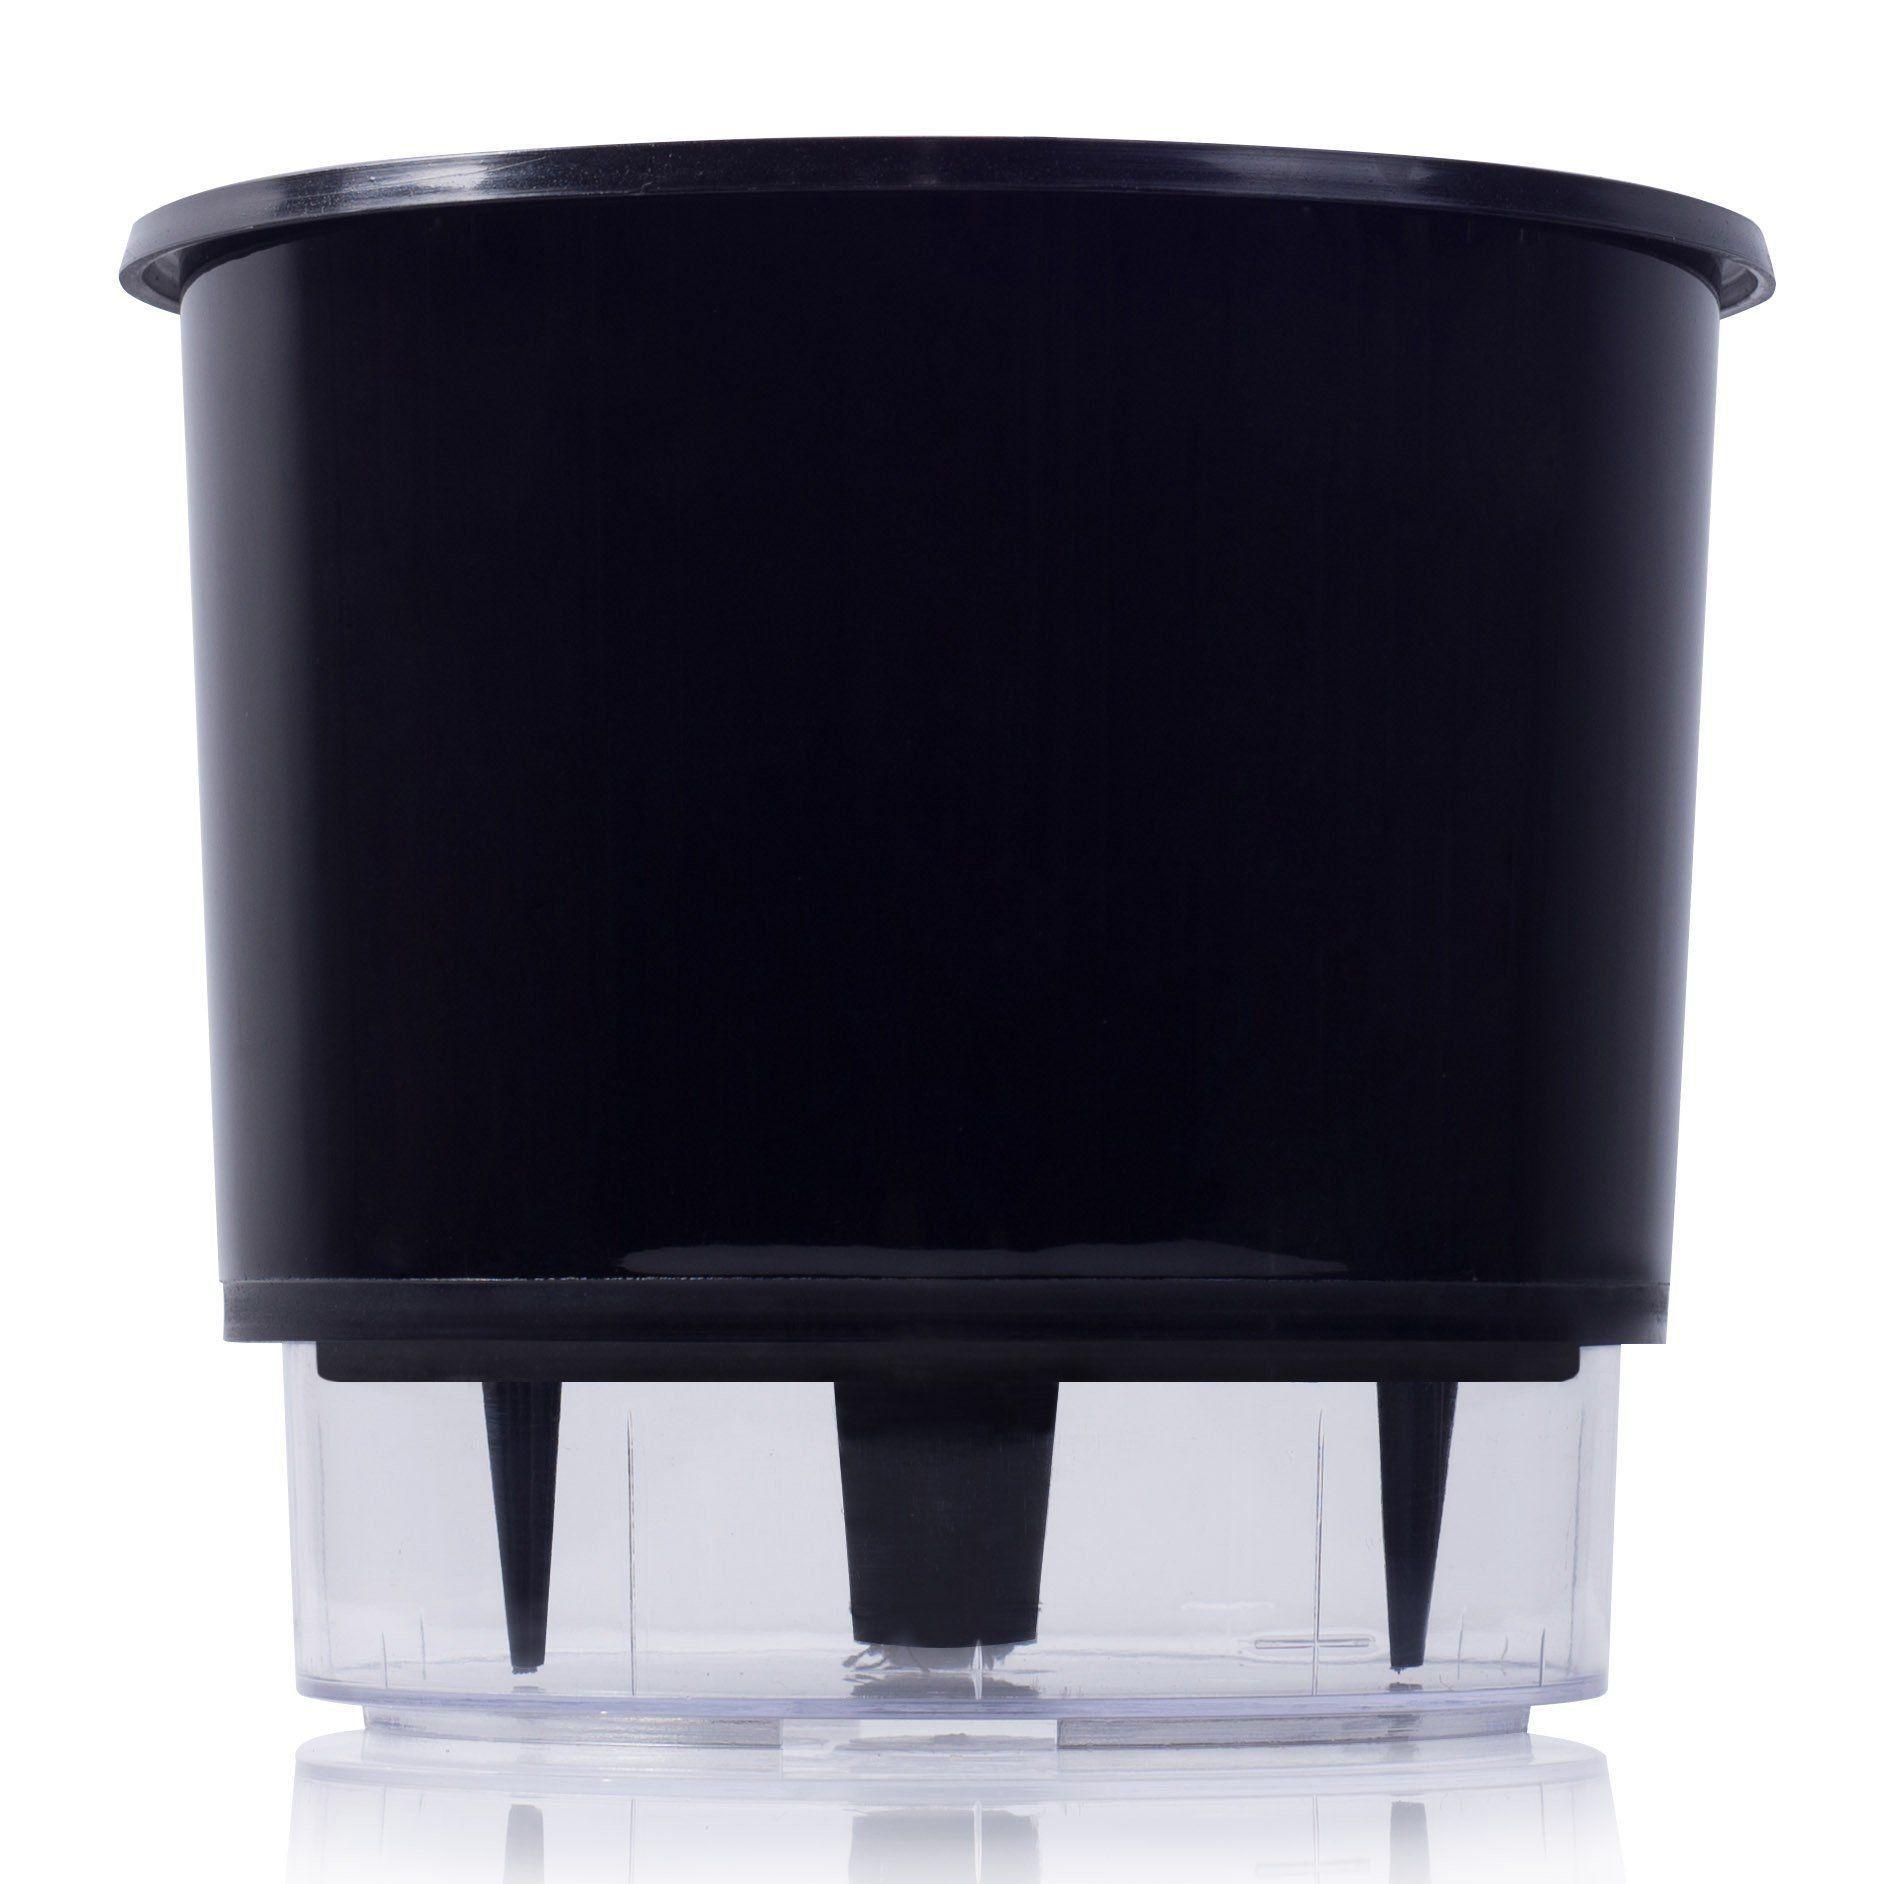 Kit 10 Vasos Autoirrigáveis N03 Médio Raiz Preto